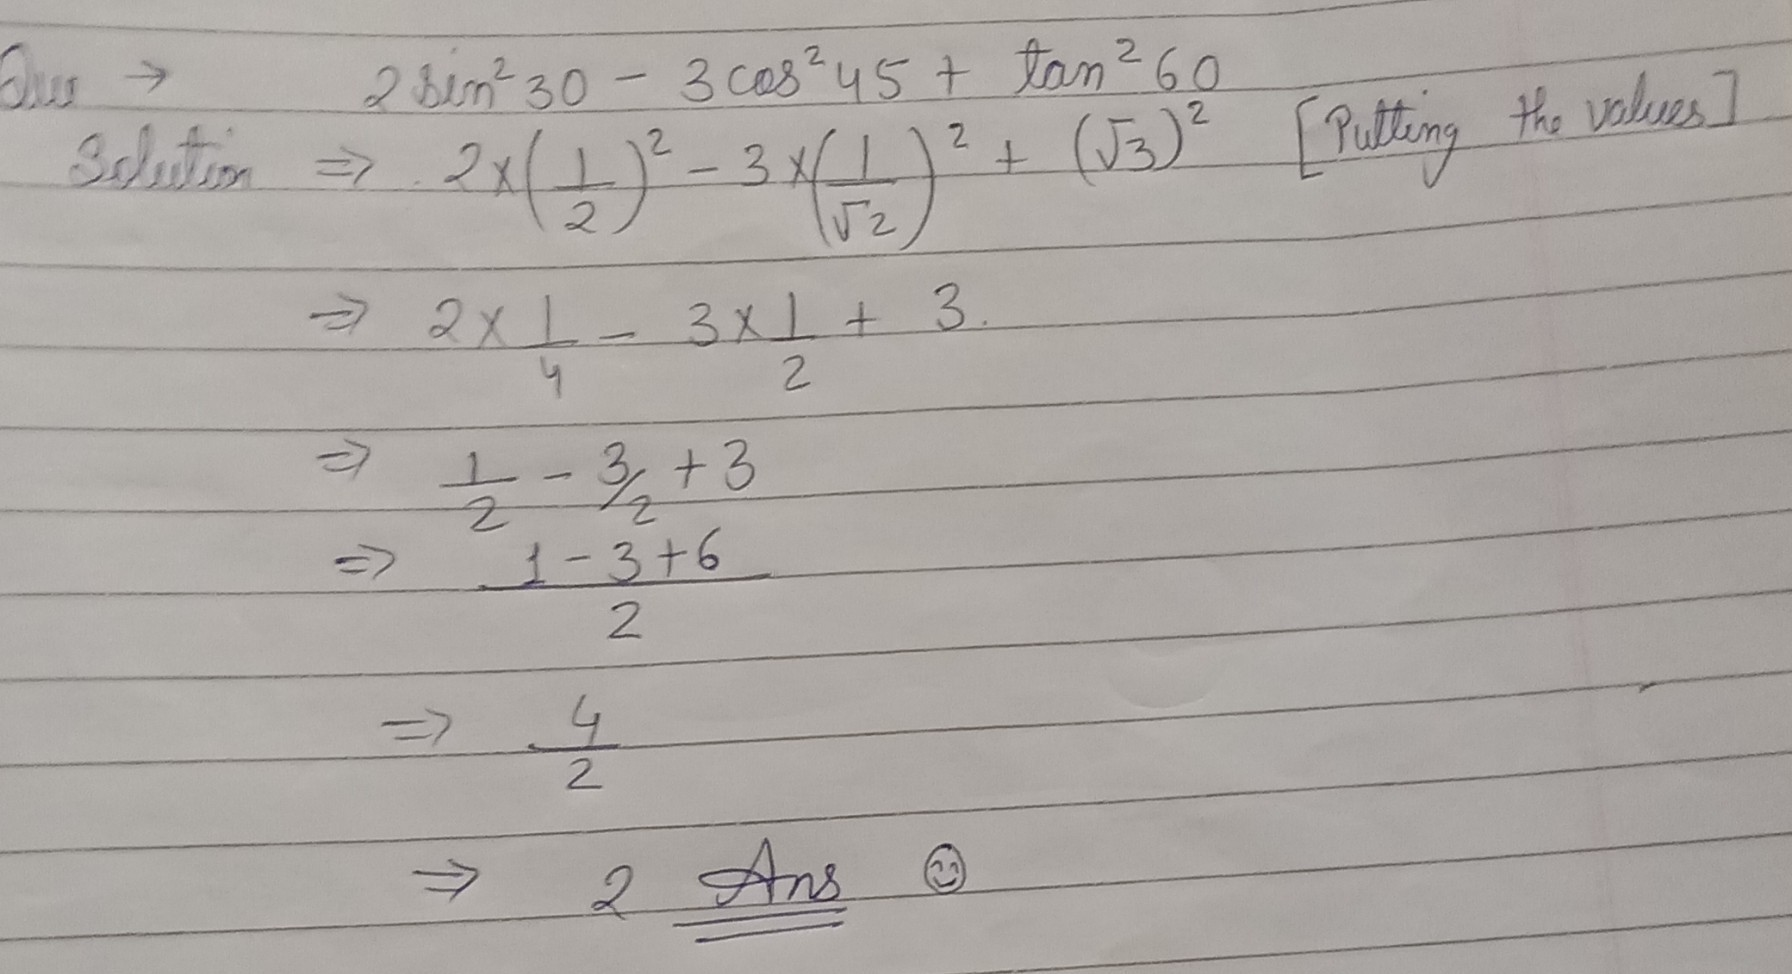 evaluate 2 sin square 30 - 3 cos square 45 + tan square 60 - Brainly in